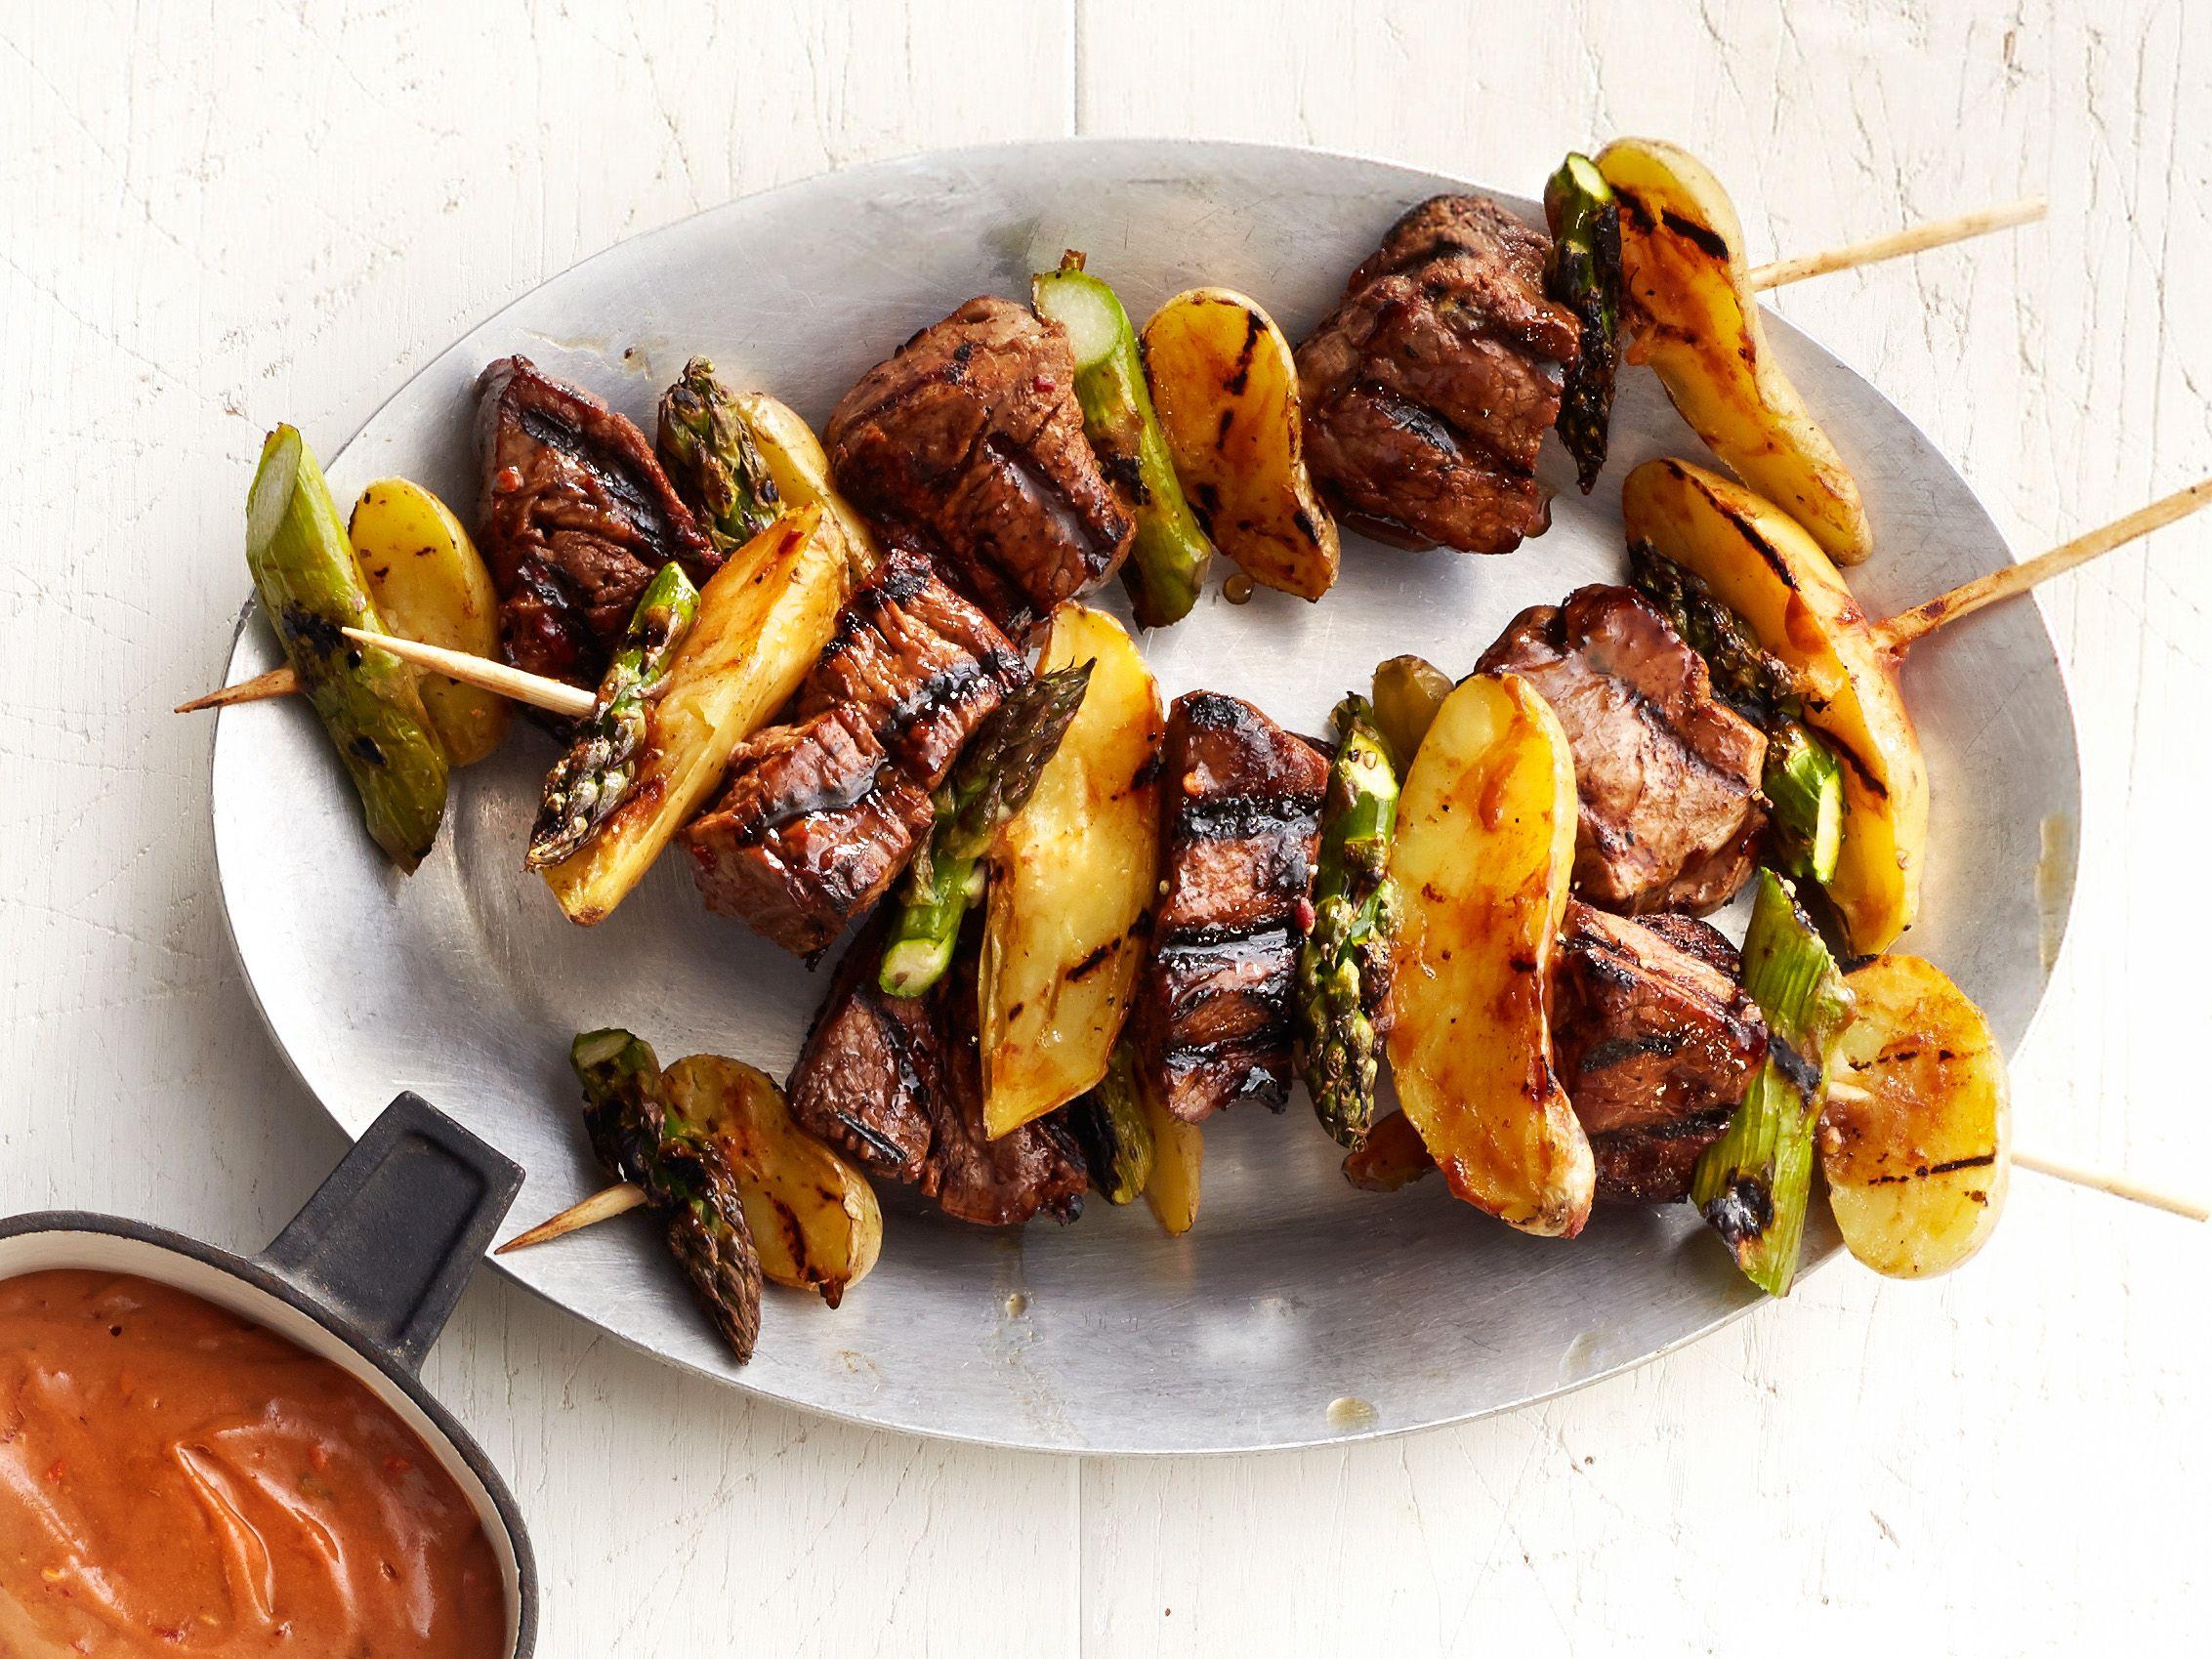 Steak and potato kebabs recipe kebabs steak and recipes forumfinder Images